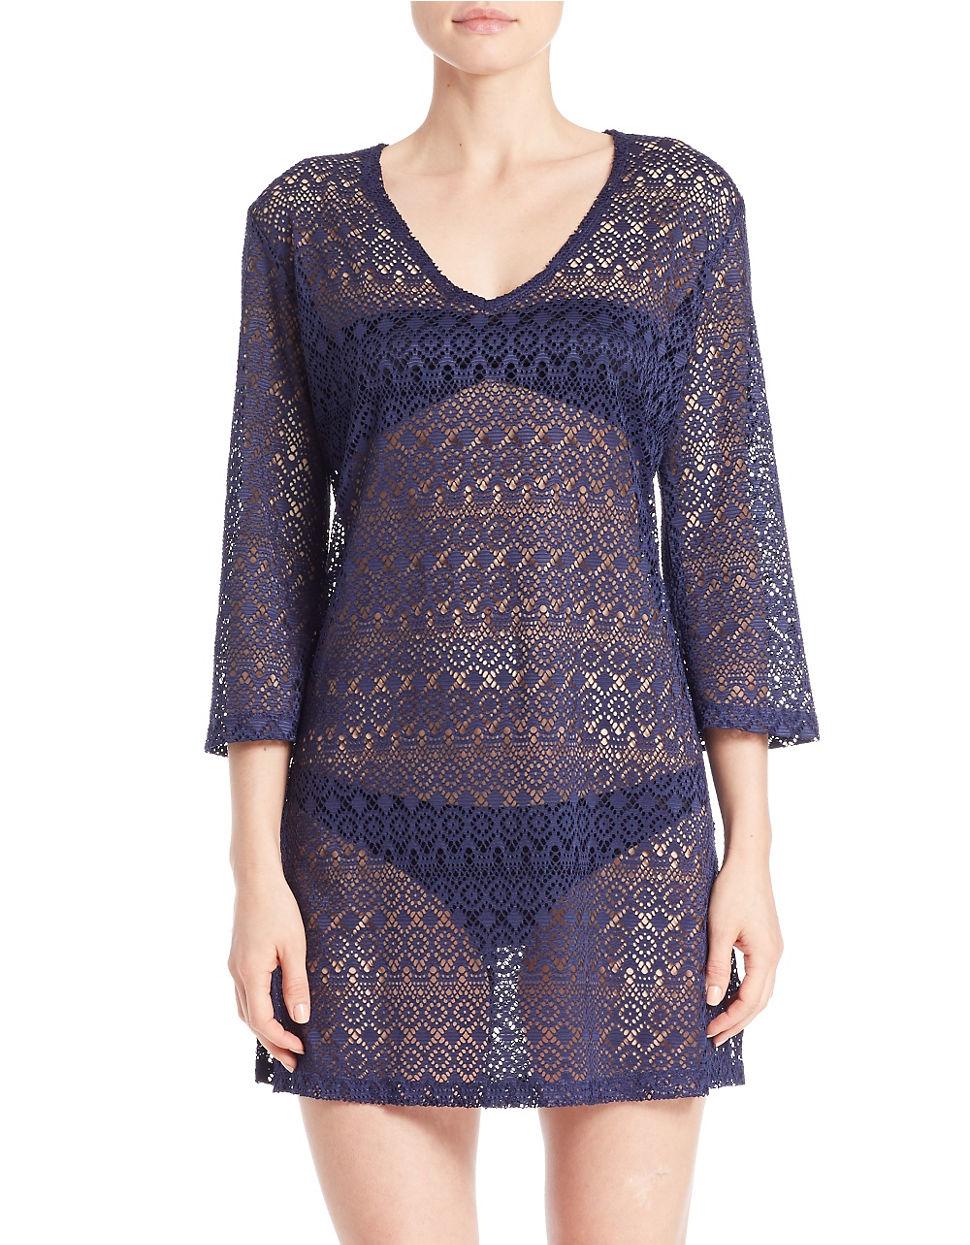 J valdi Mesh Dress Cover-up in Blue | Lyst